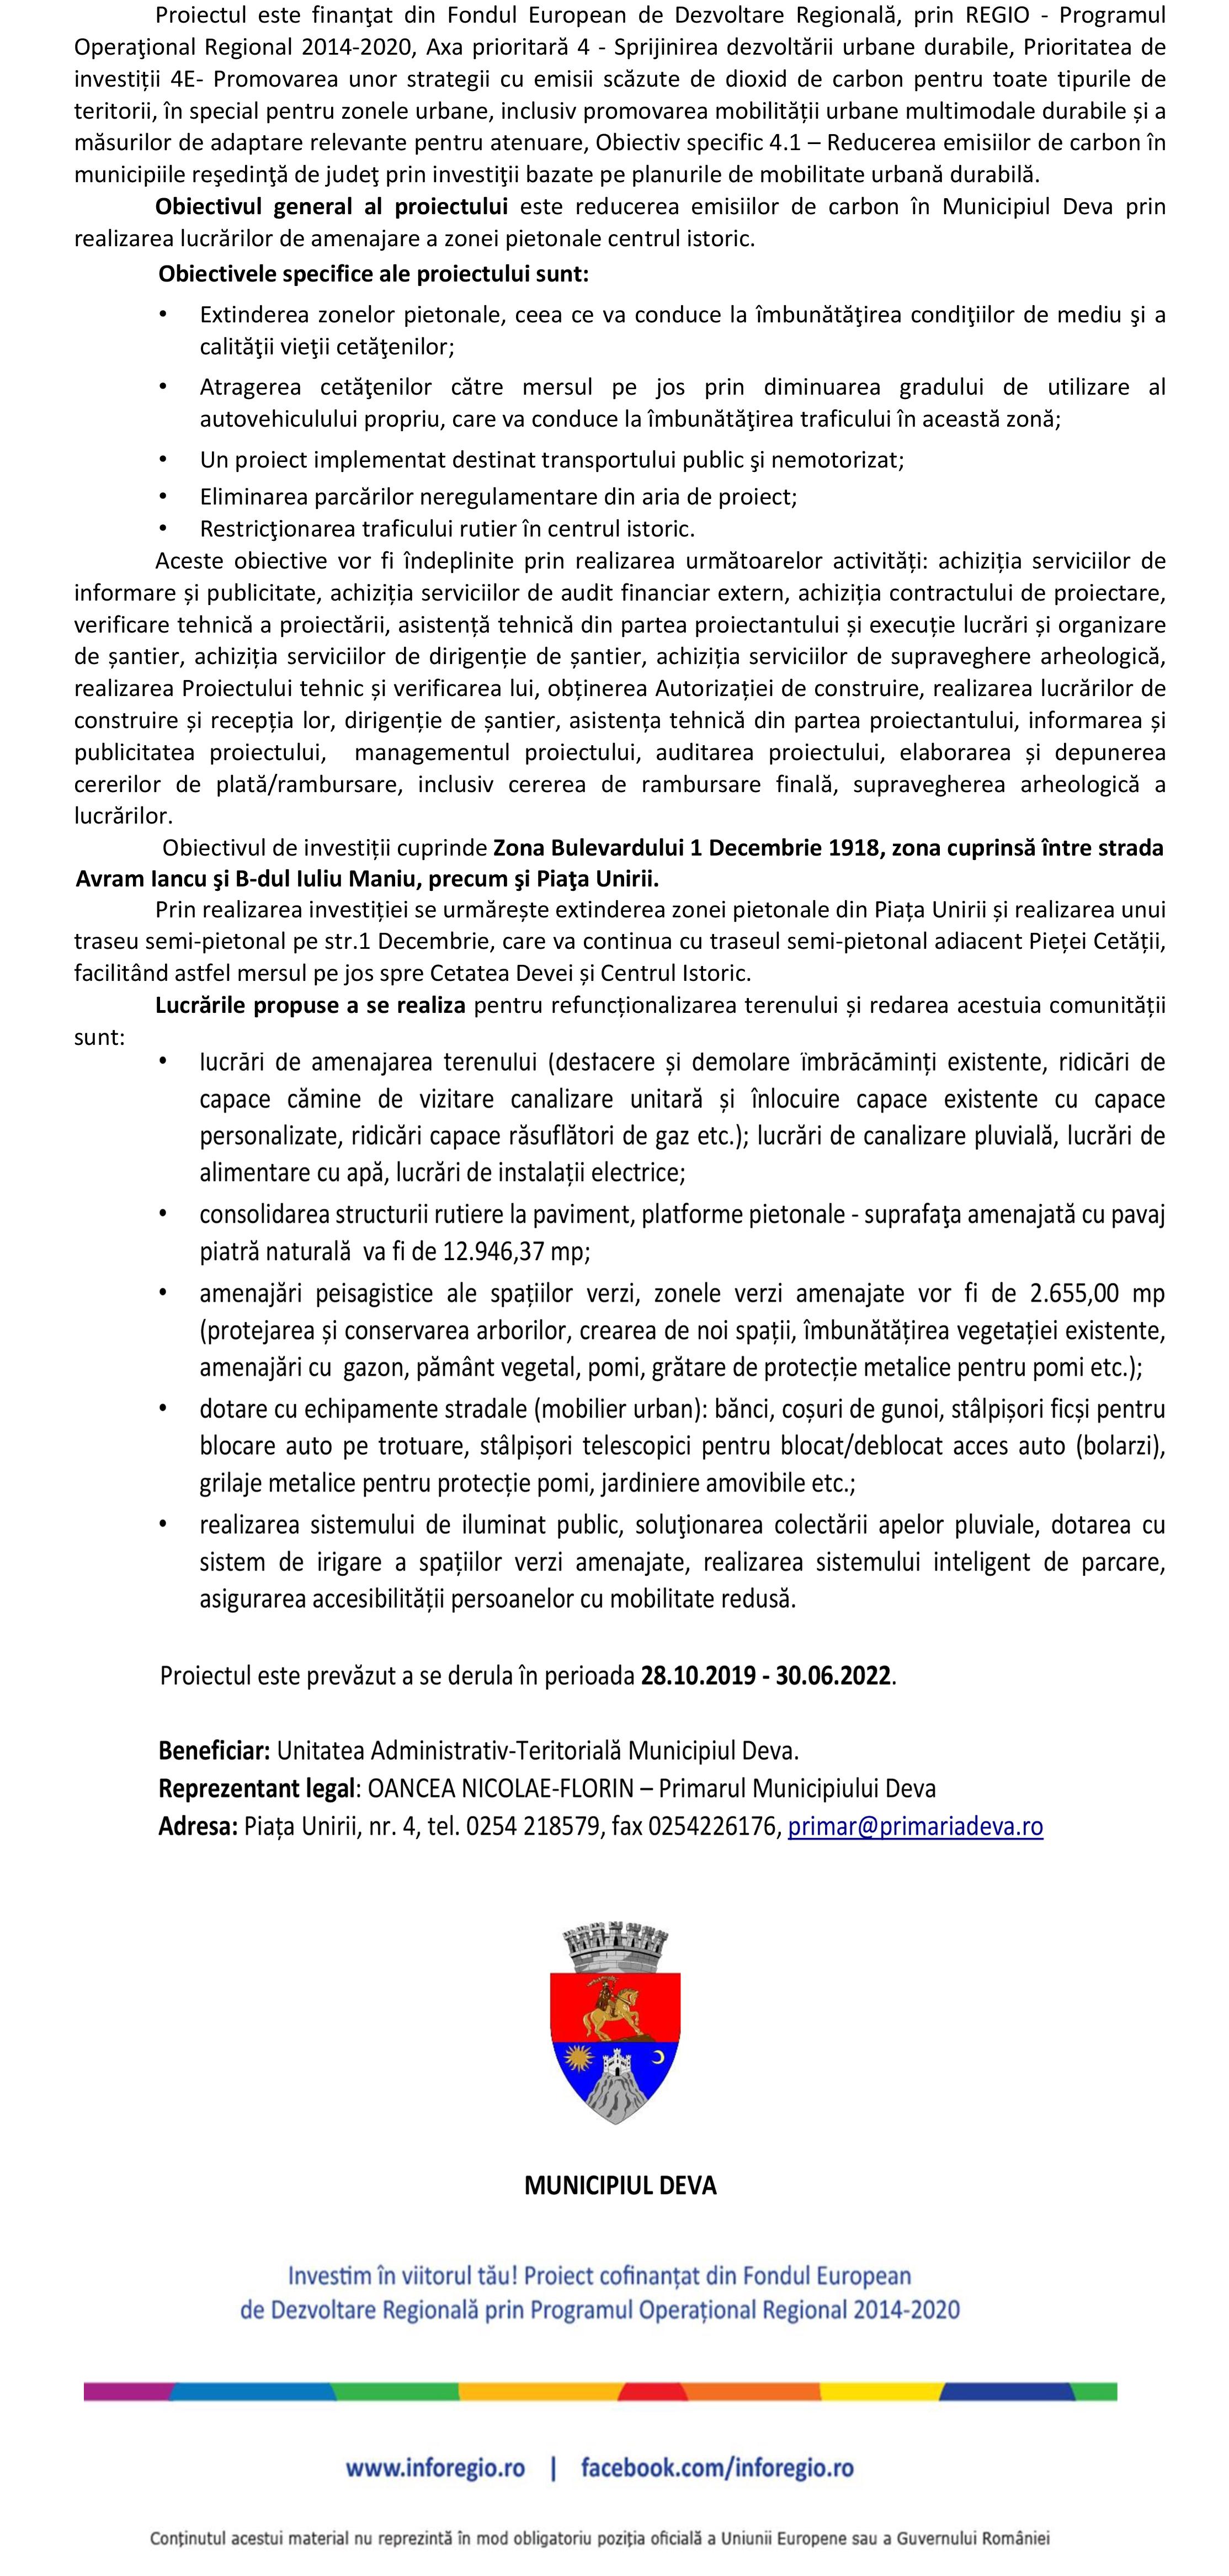 Microsoft Word - Comunicat Lansare proiect_Municipiul Deva 2.pdf